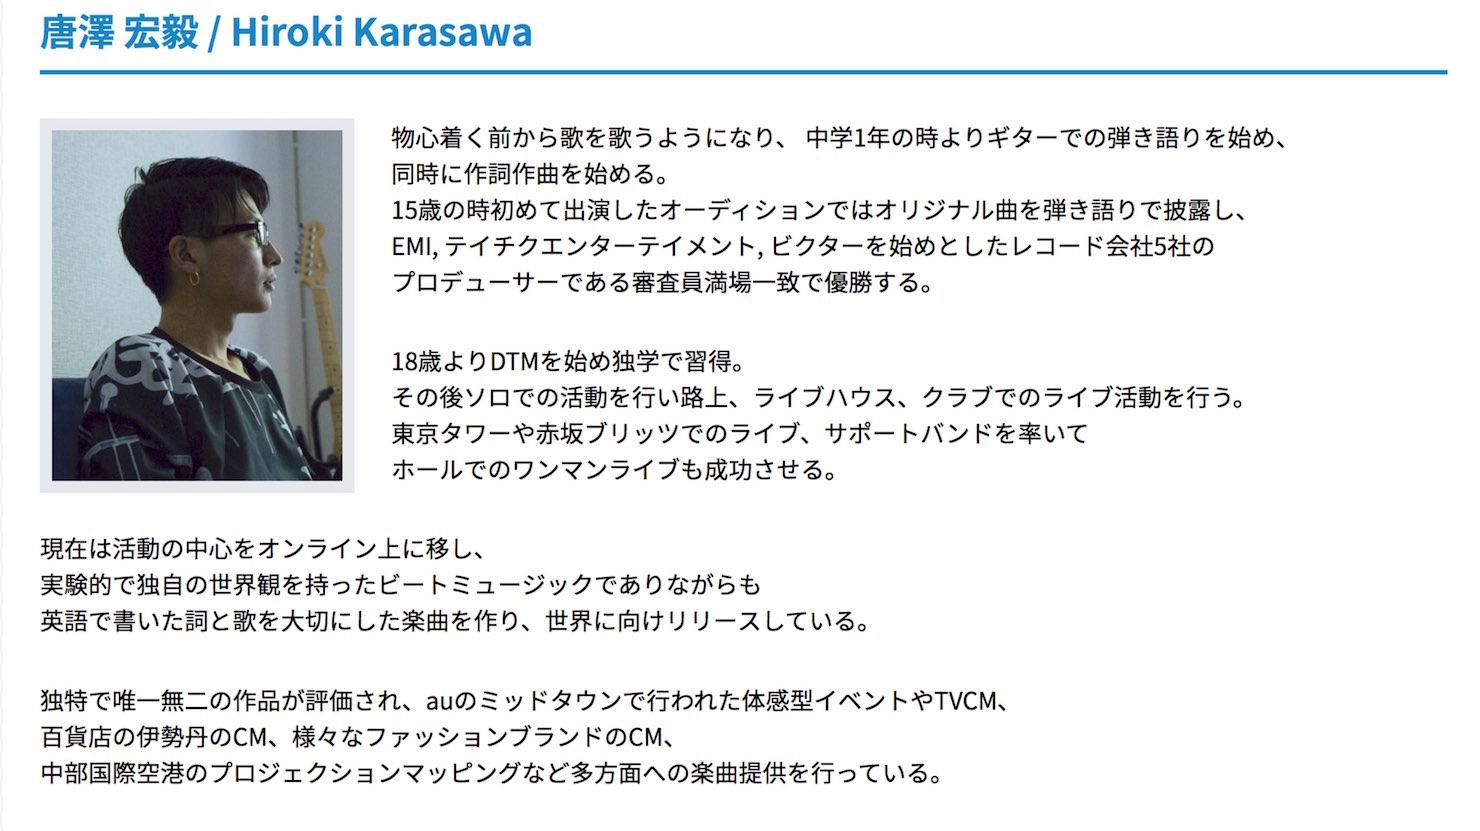 Hiroki Karasawa